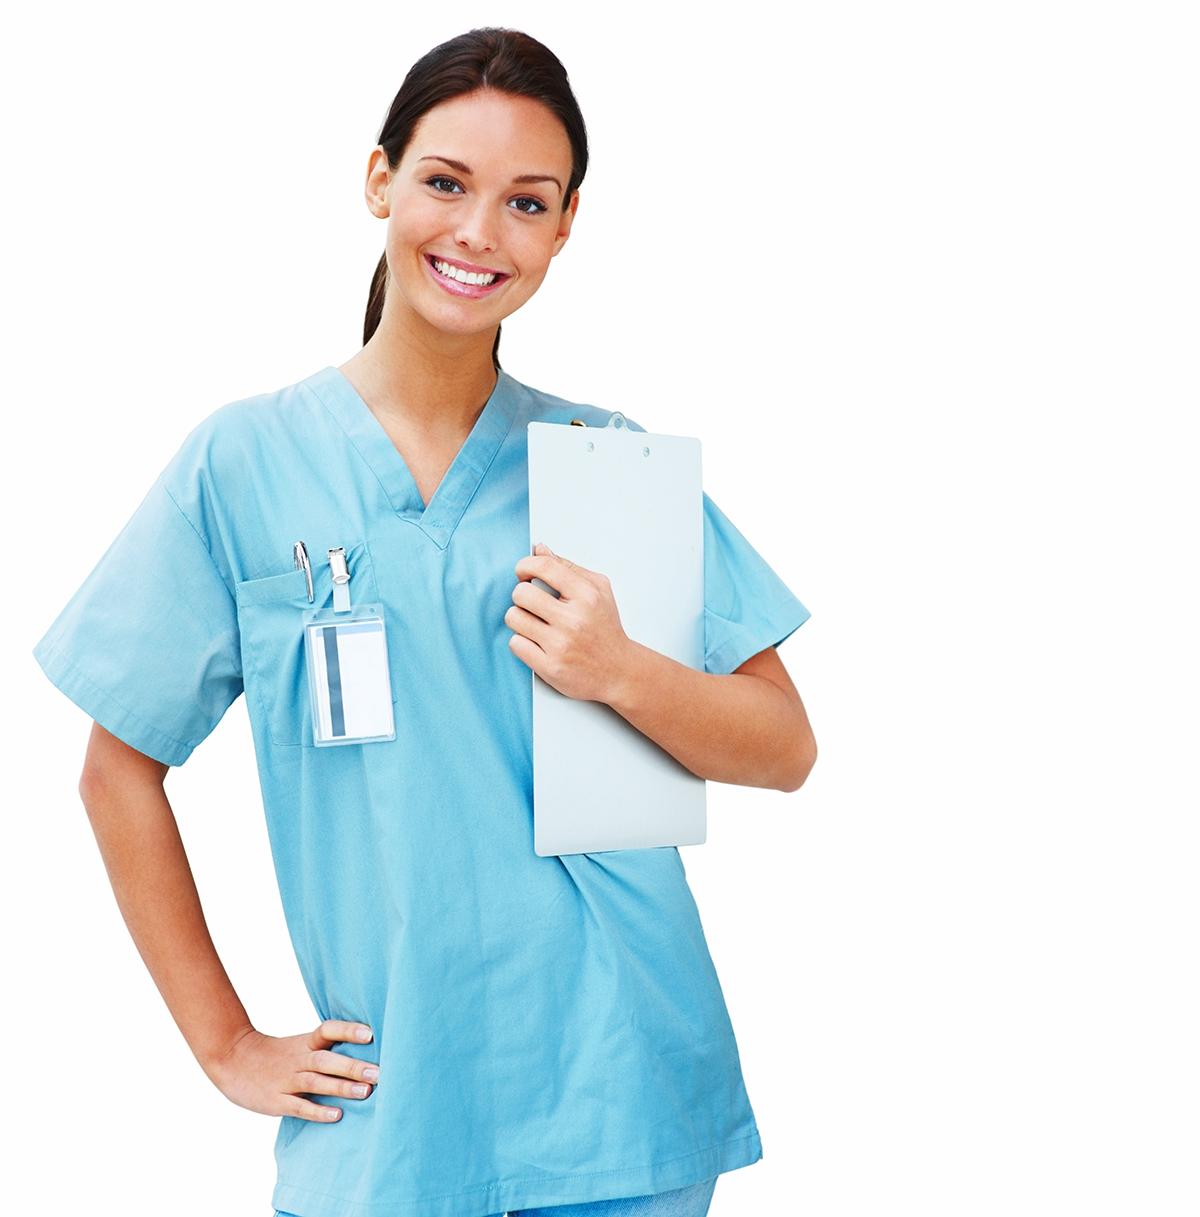 find-the-best-certified-nursing-assistant-schools-5092